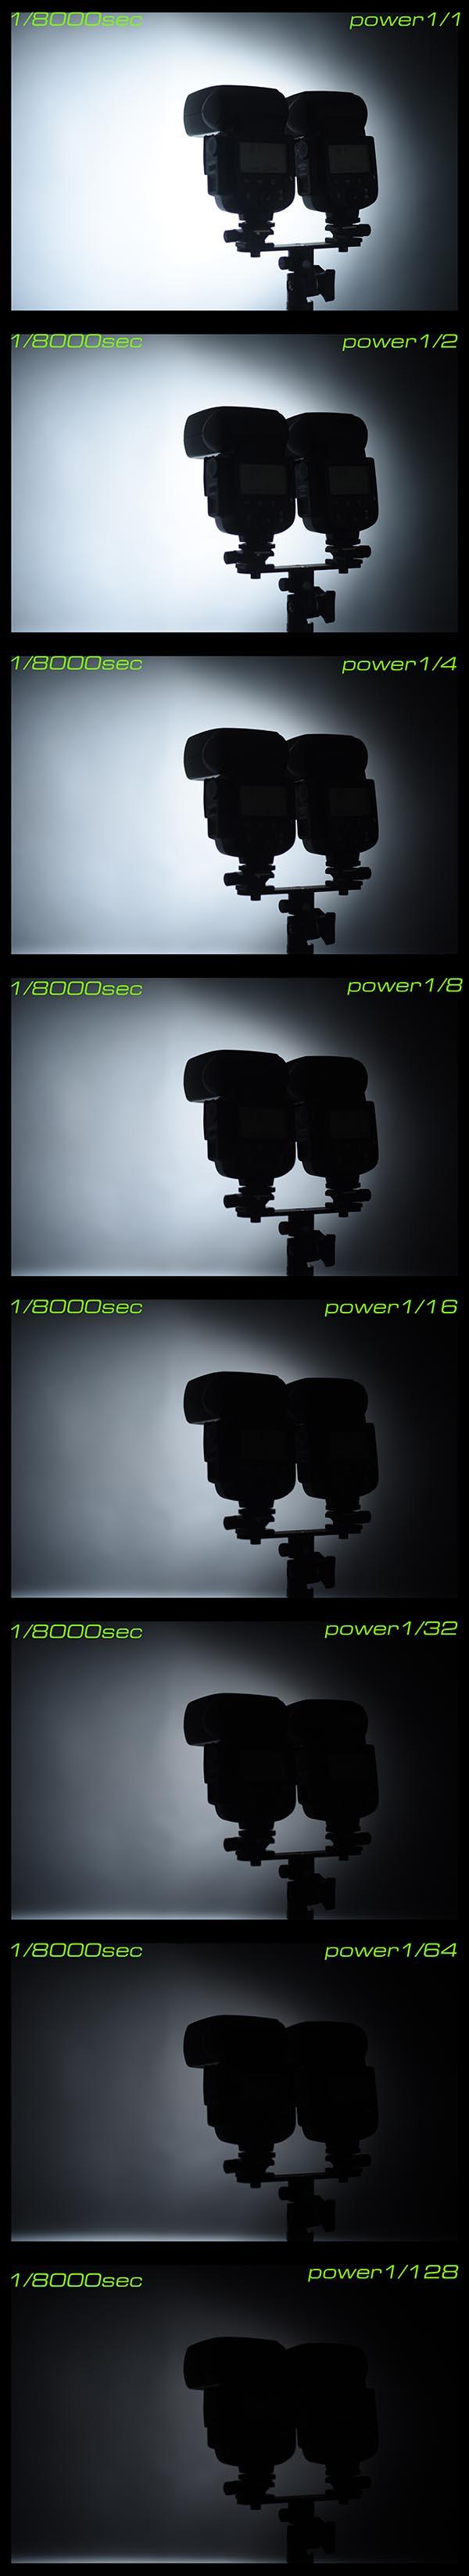 power1-128